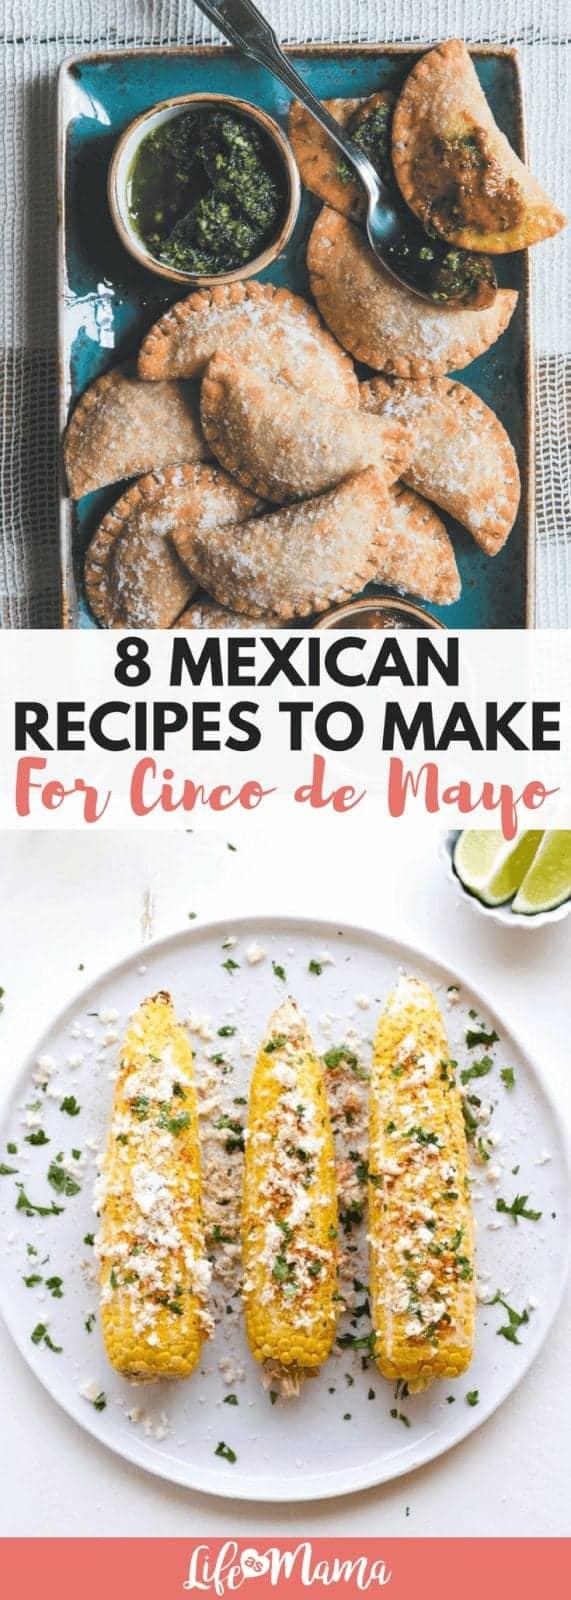 8 Mexican Recipes To Make For Cinco de Mayo